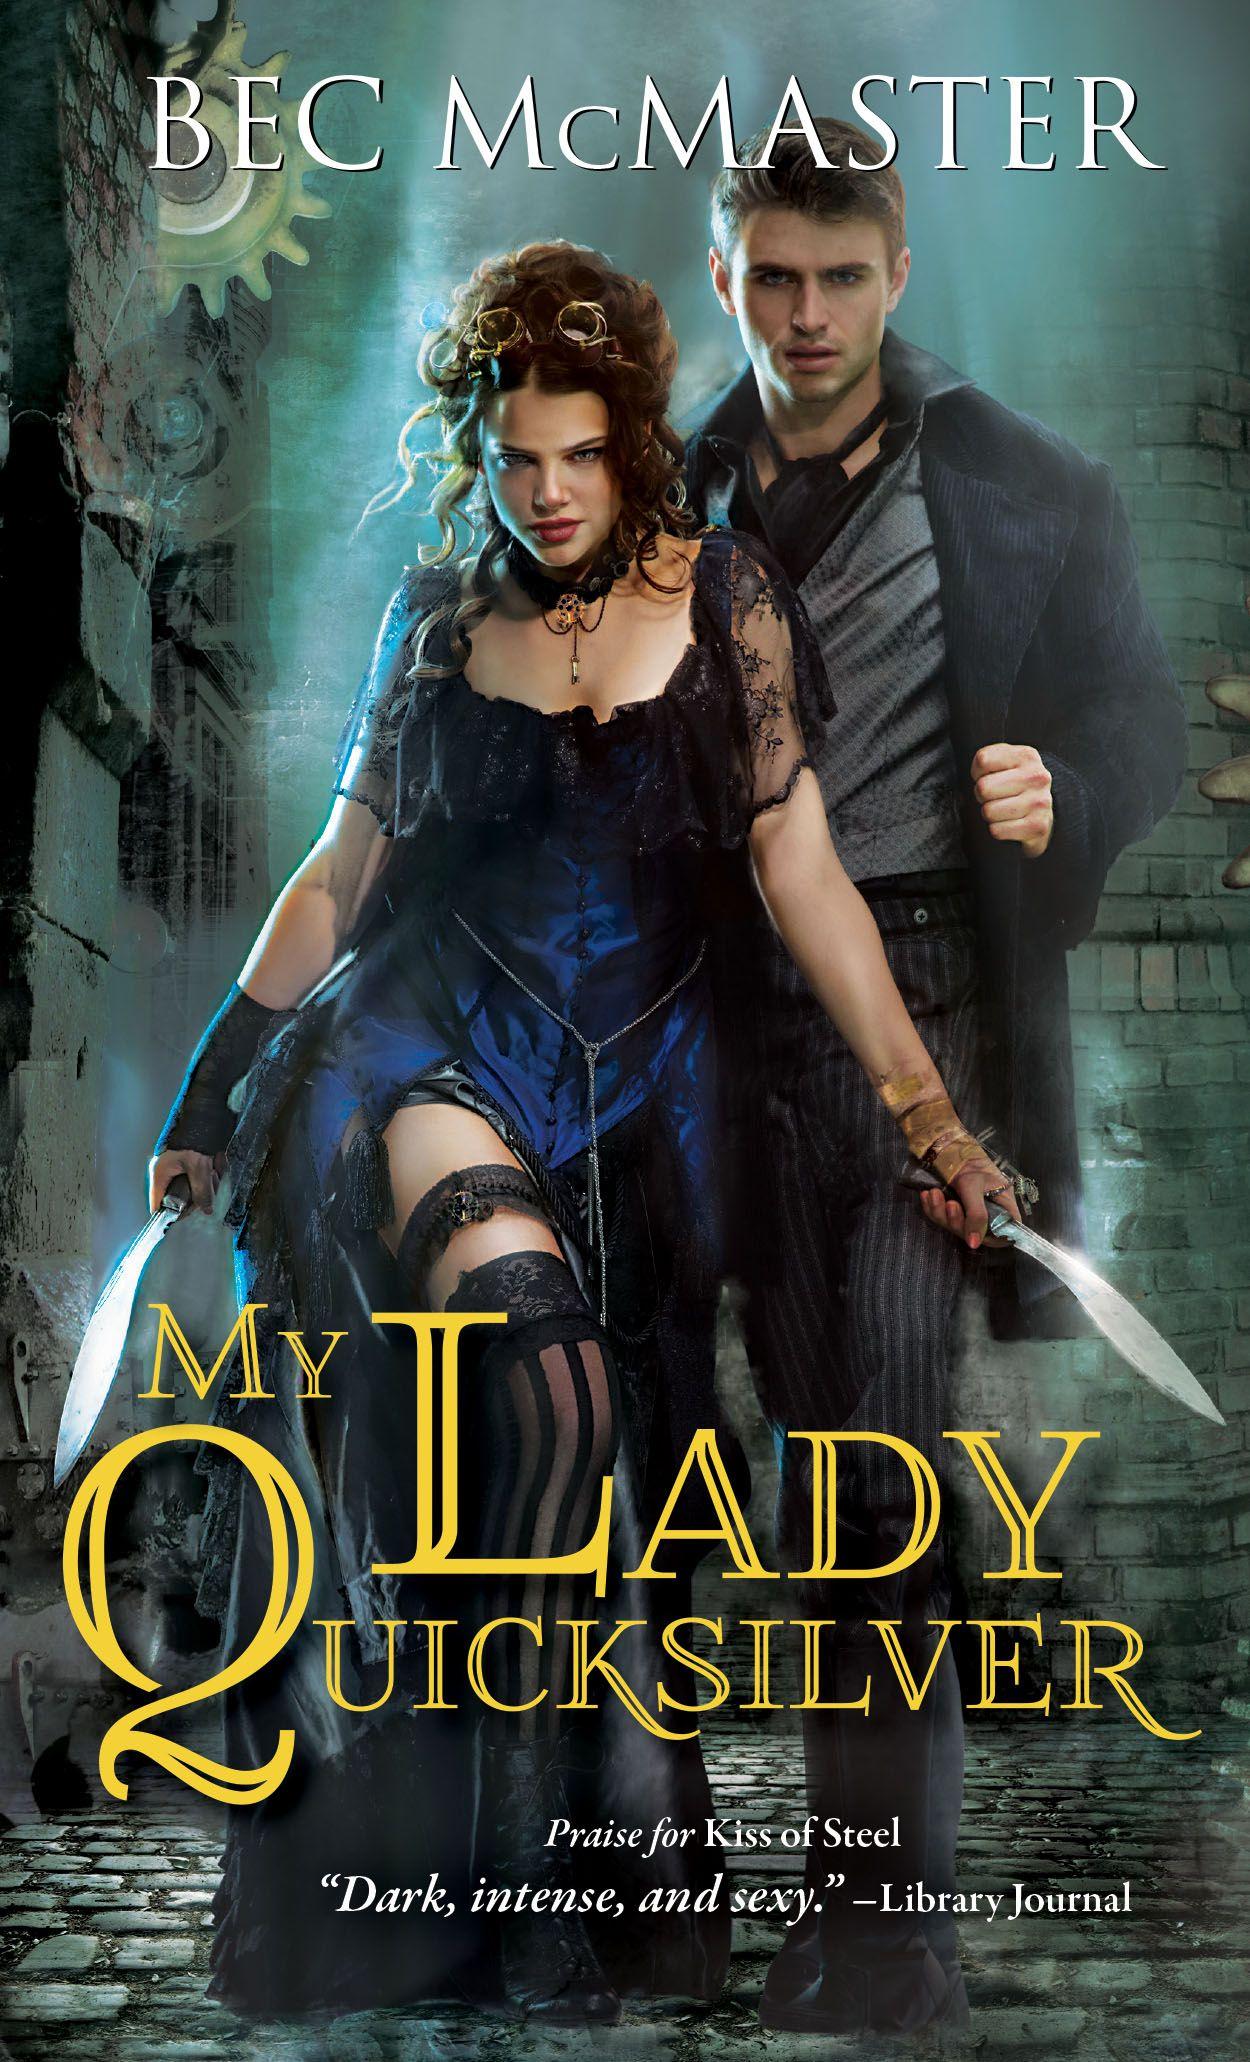 Lady Quicksilver - Bec Mcmaster